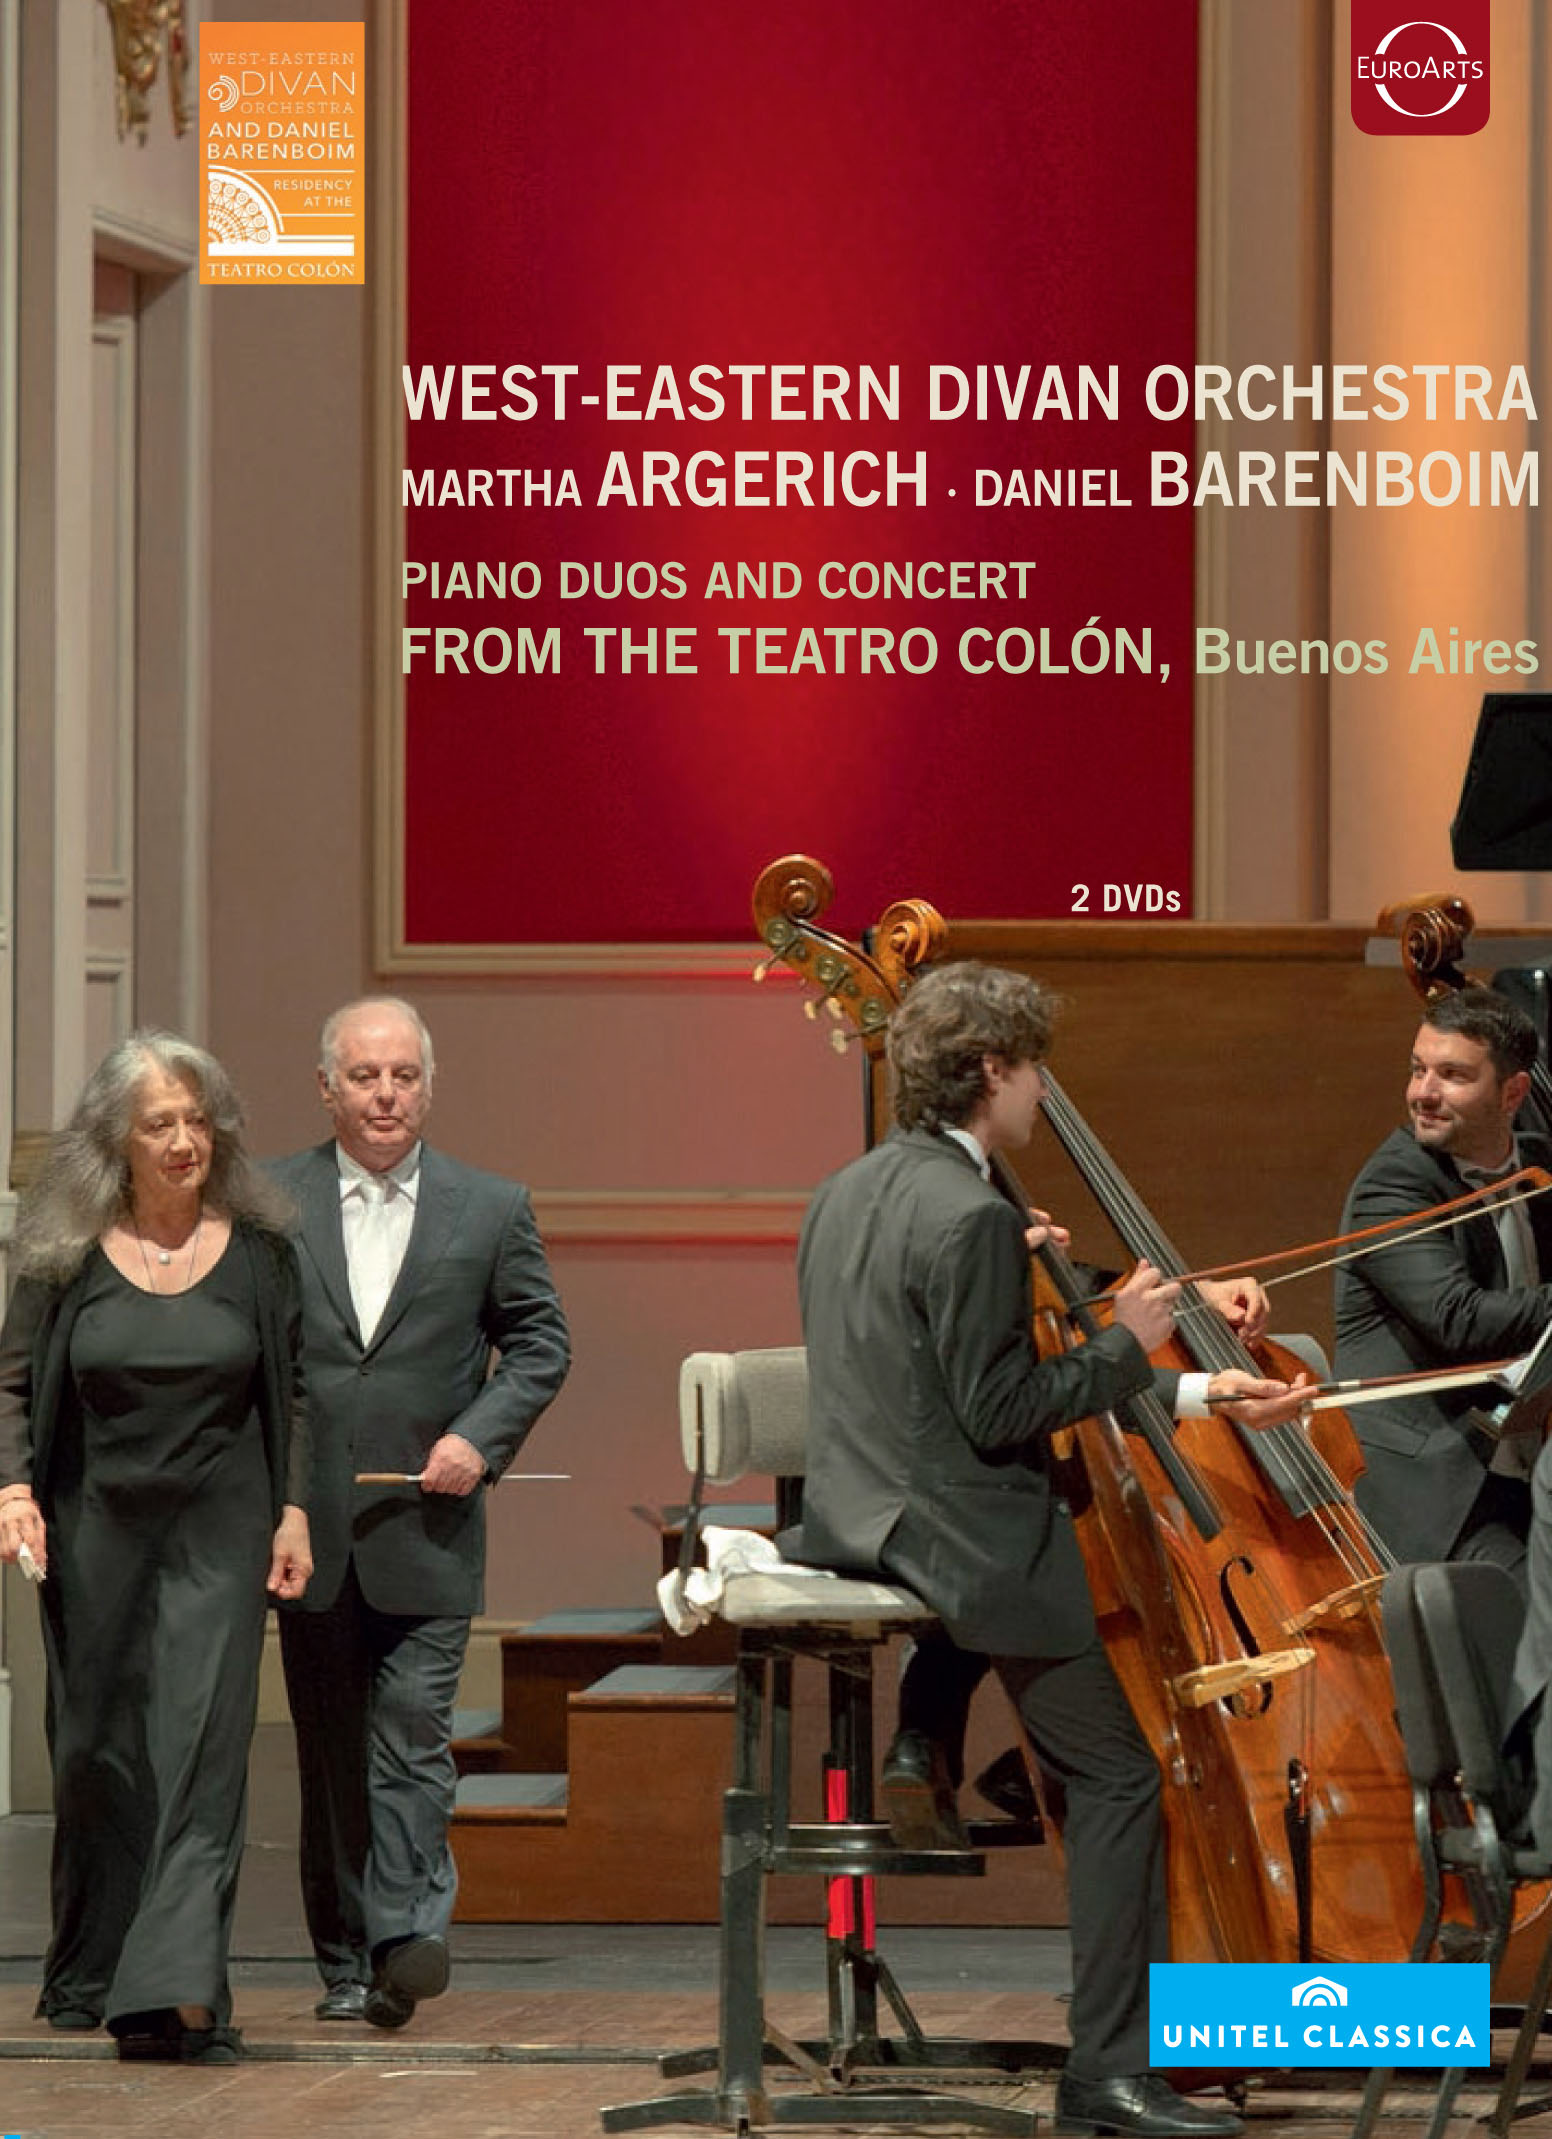 Martha Argerich/Daniel Barenboim: West-Eastern Divan Orchestra